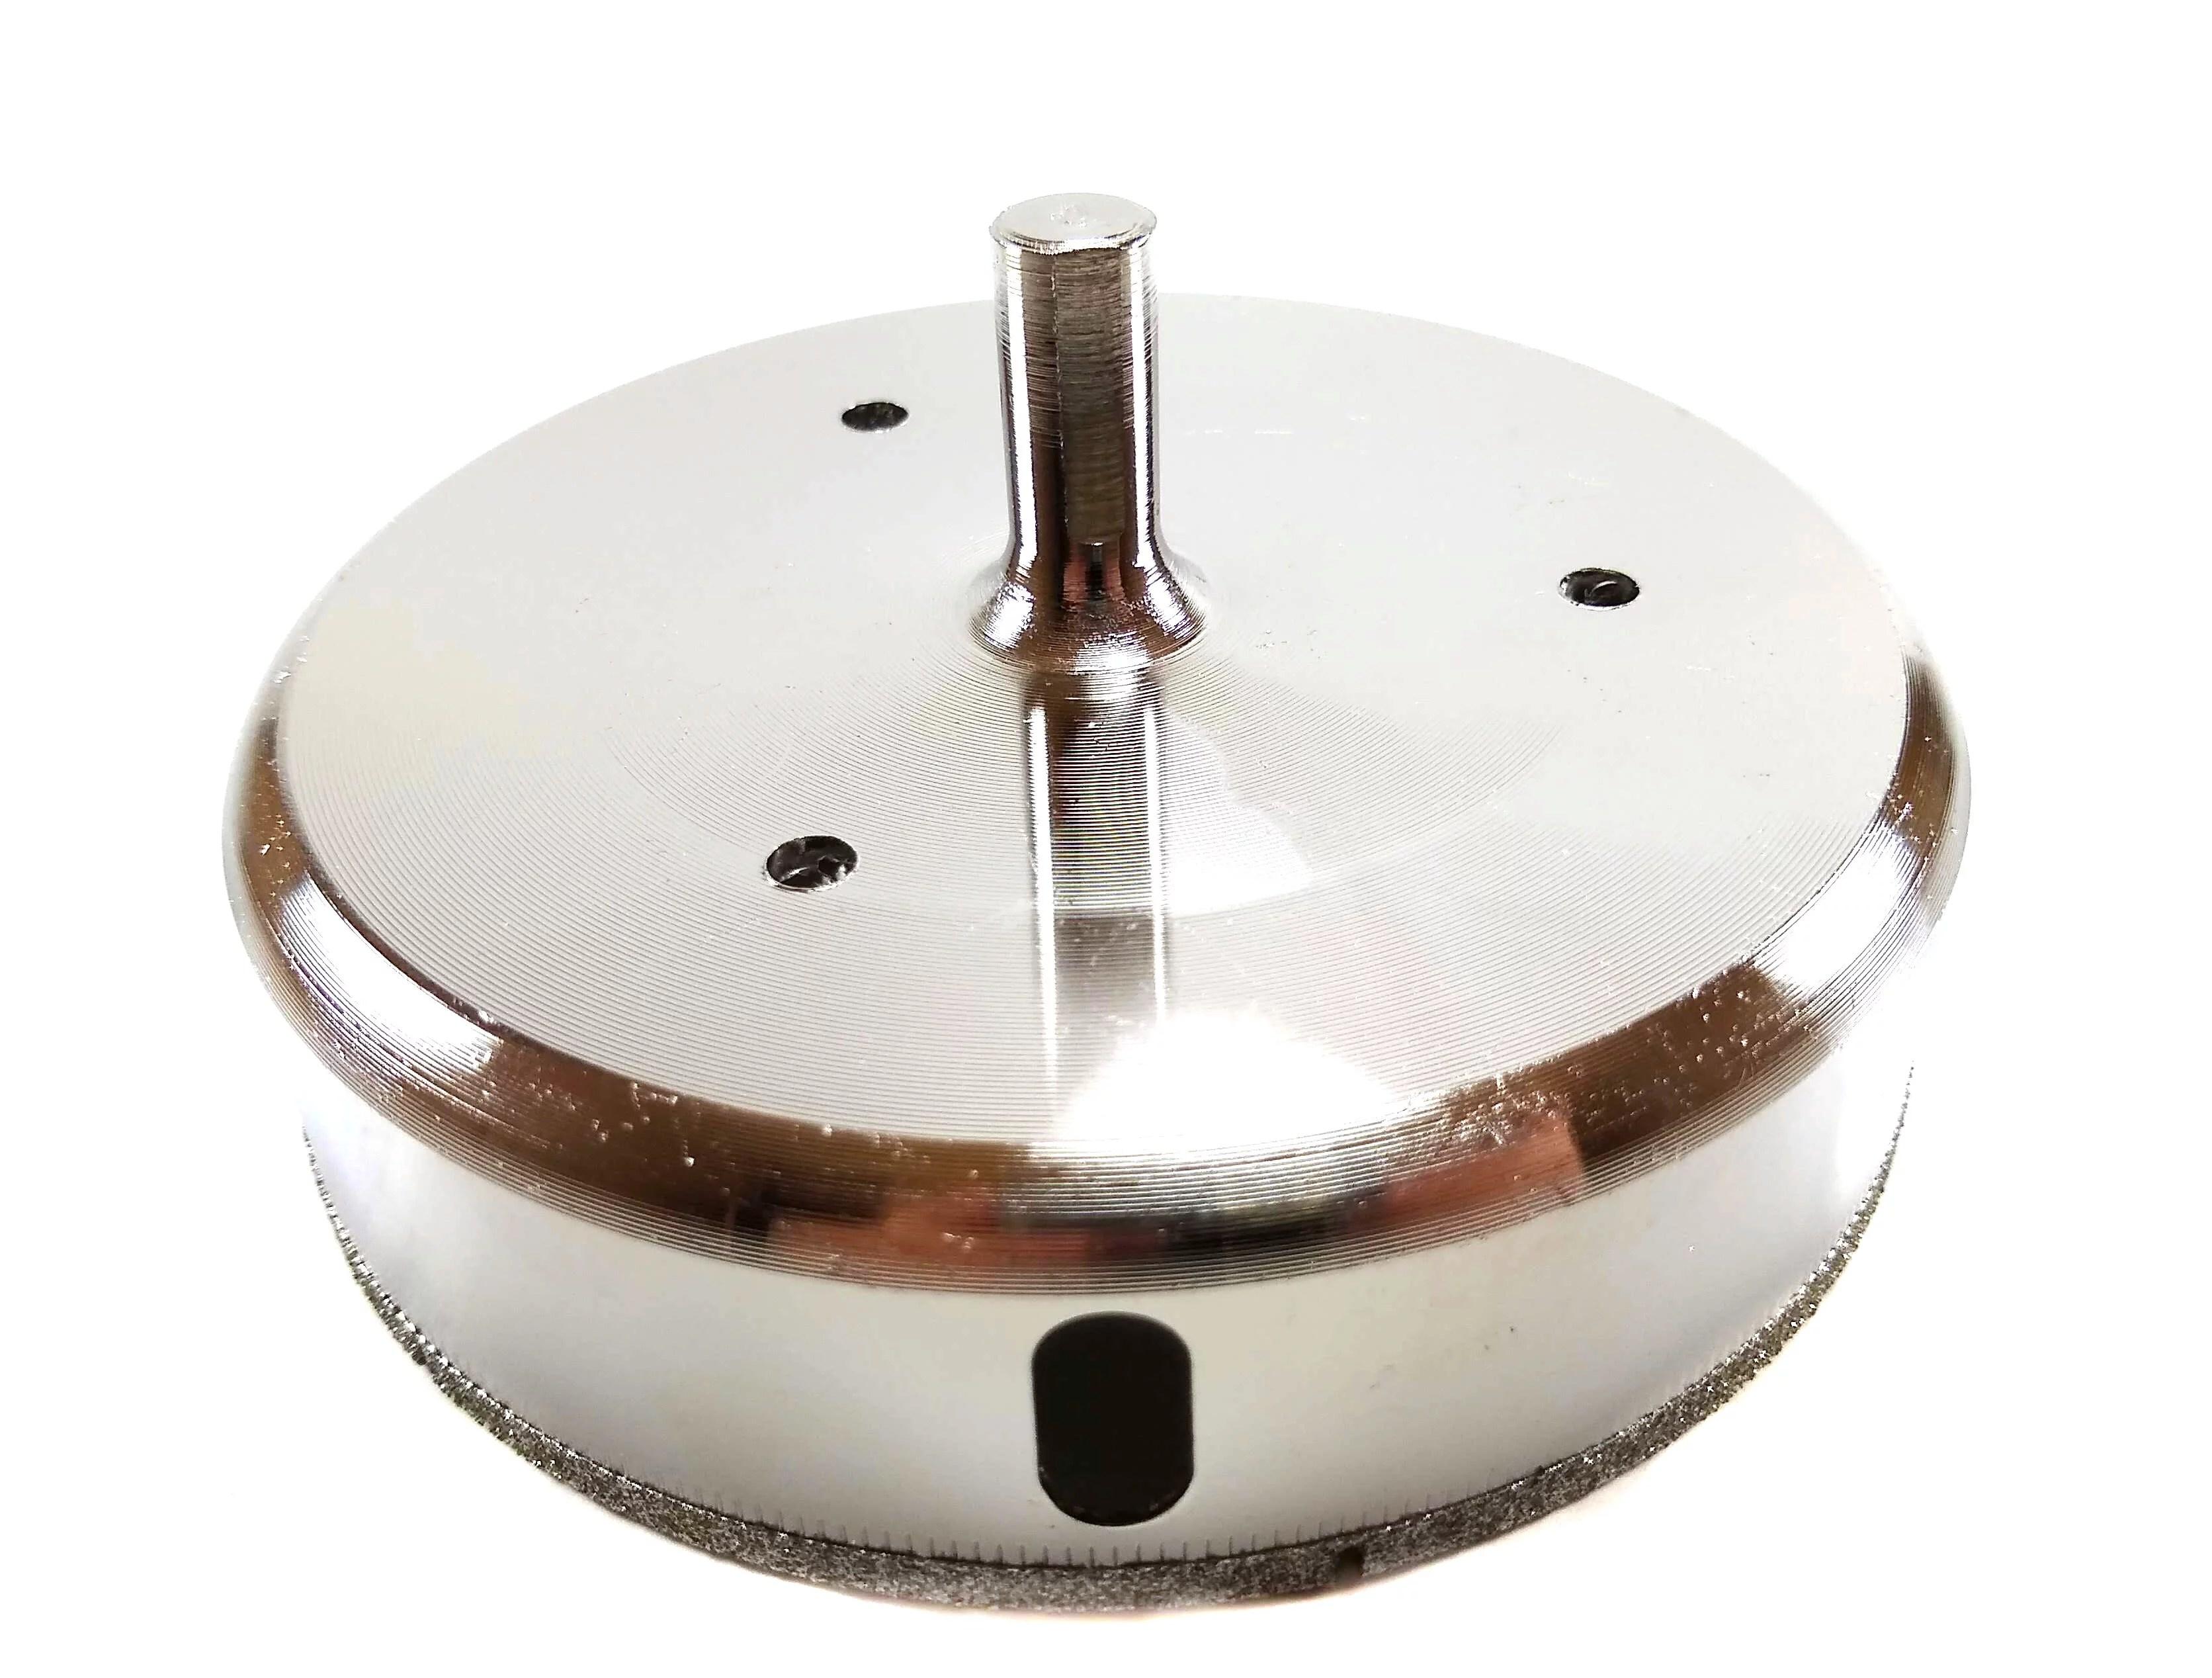 4 1 2 inch diamond hole saw diamond tipped porcelain tile ceramic glass 4 5 inch hole saw drill bit standard shank easy to use by drilax walmart com